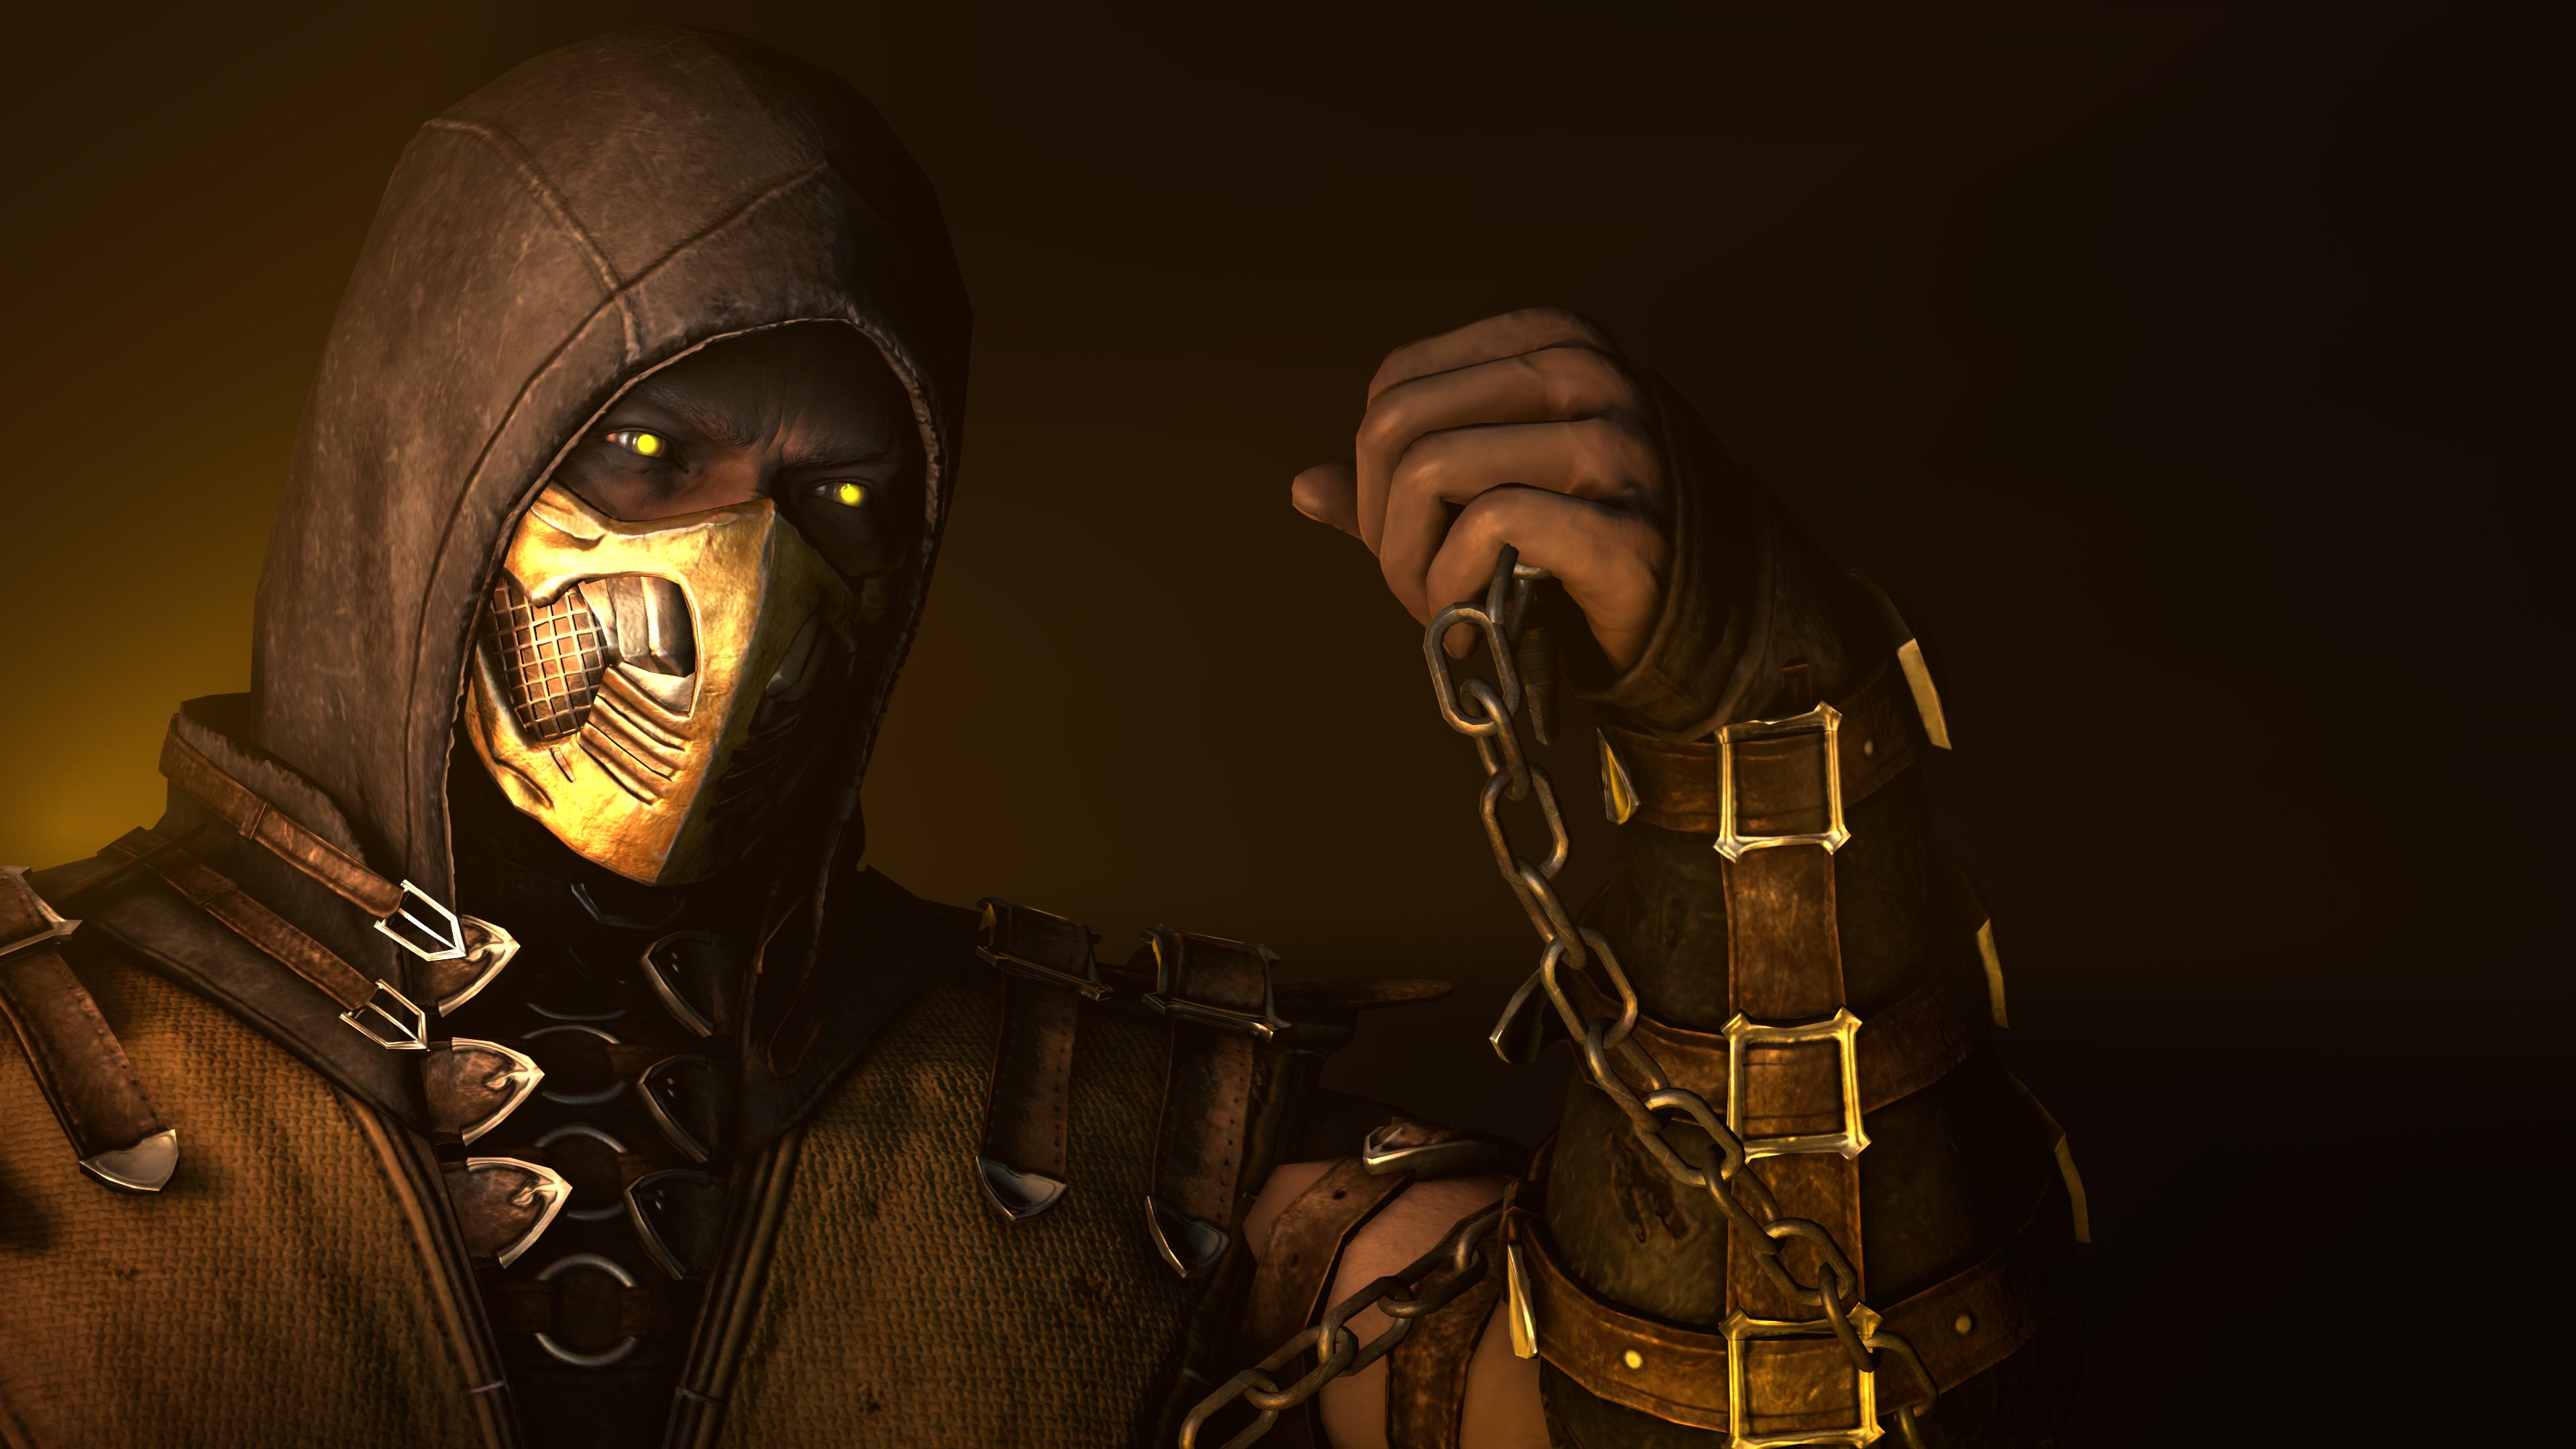 Mortal Kombat X 4k Ultra Hd Wallpaper Background Image